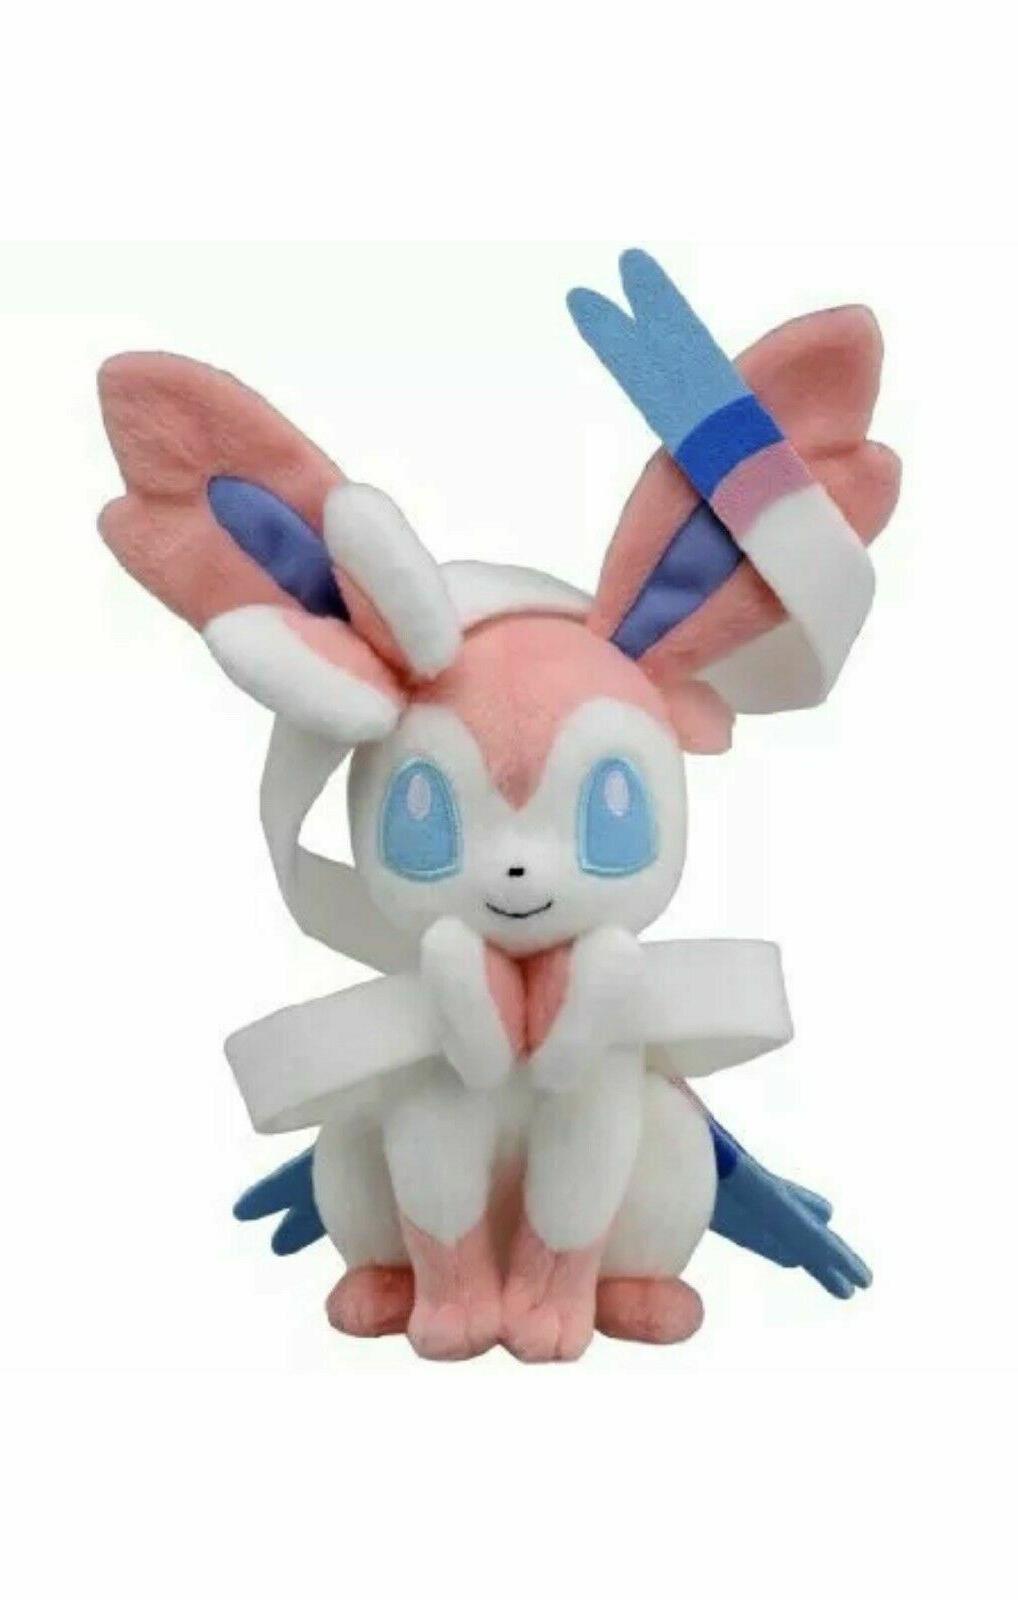 Eevee Sylveon Plush  Stuffed Animal Figure Soft Toy Gift NWT